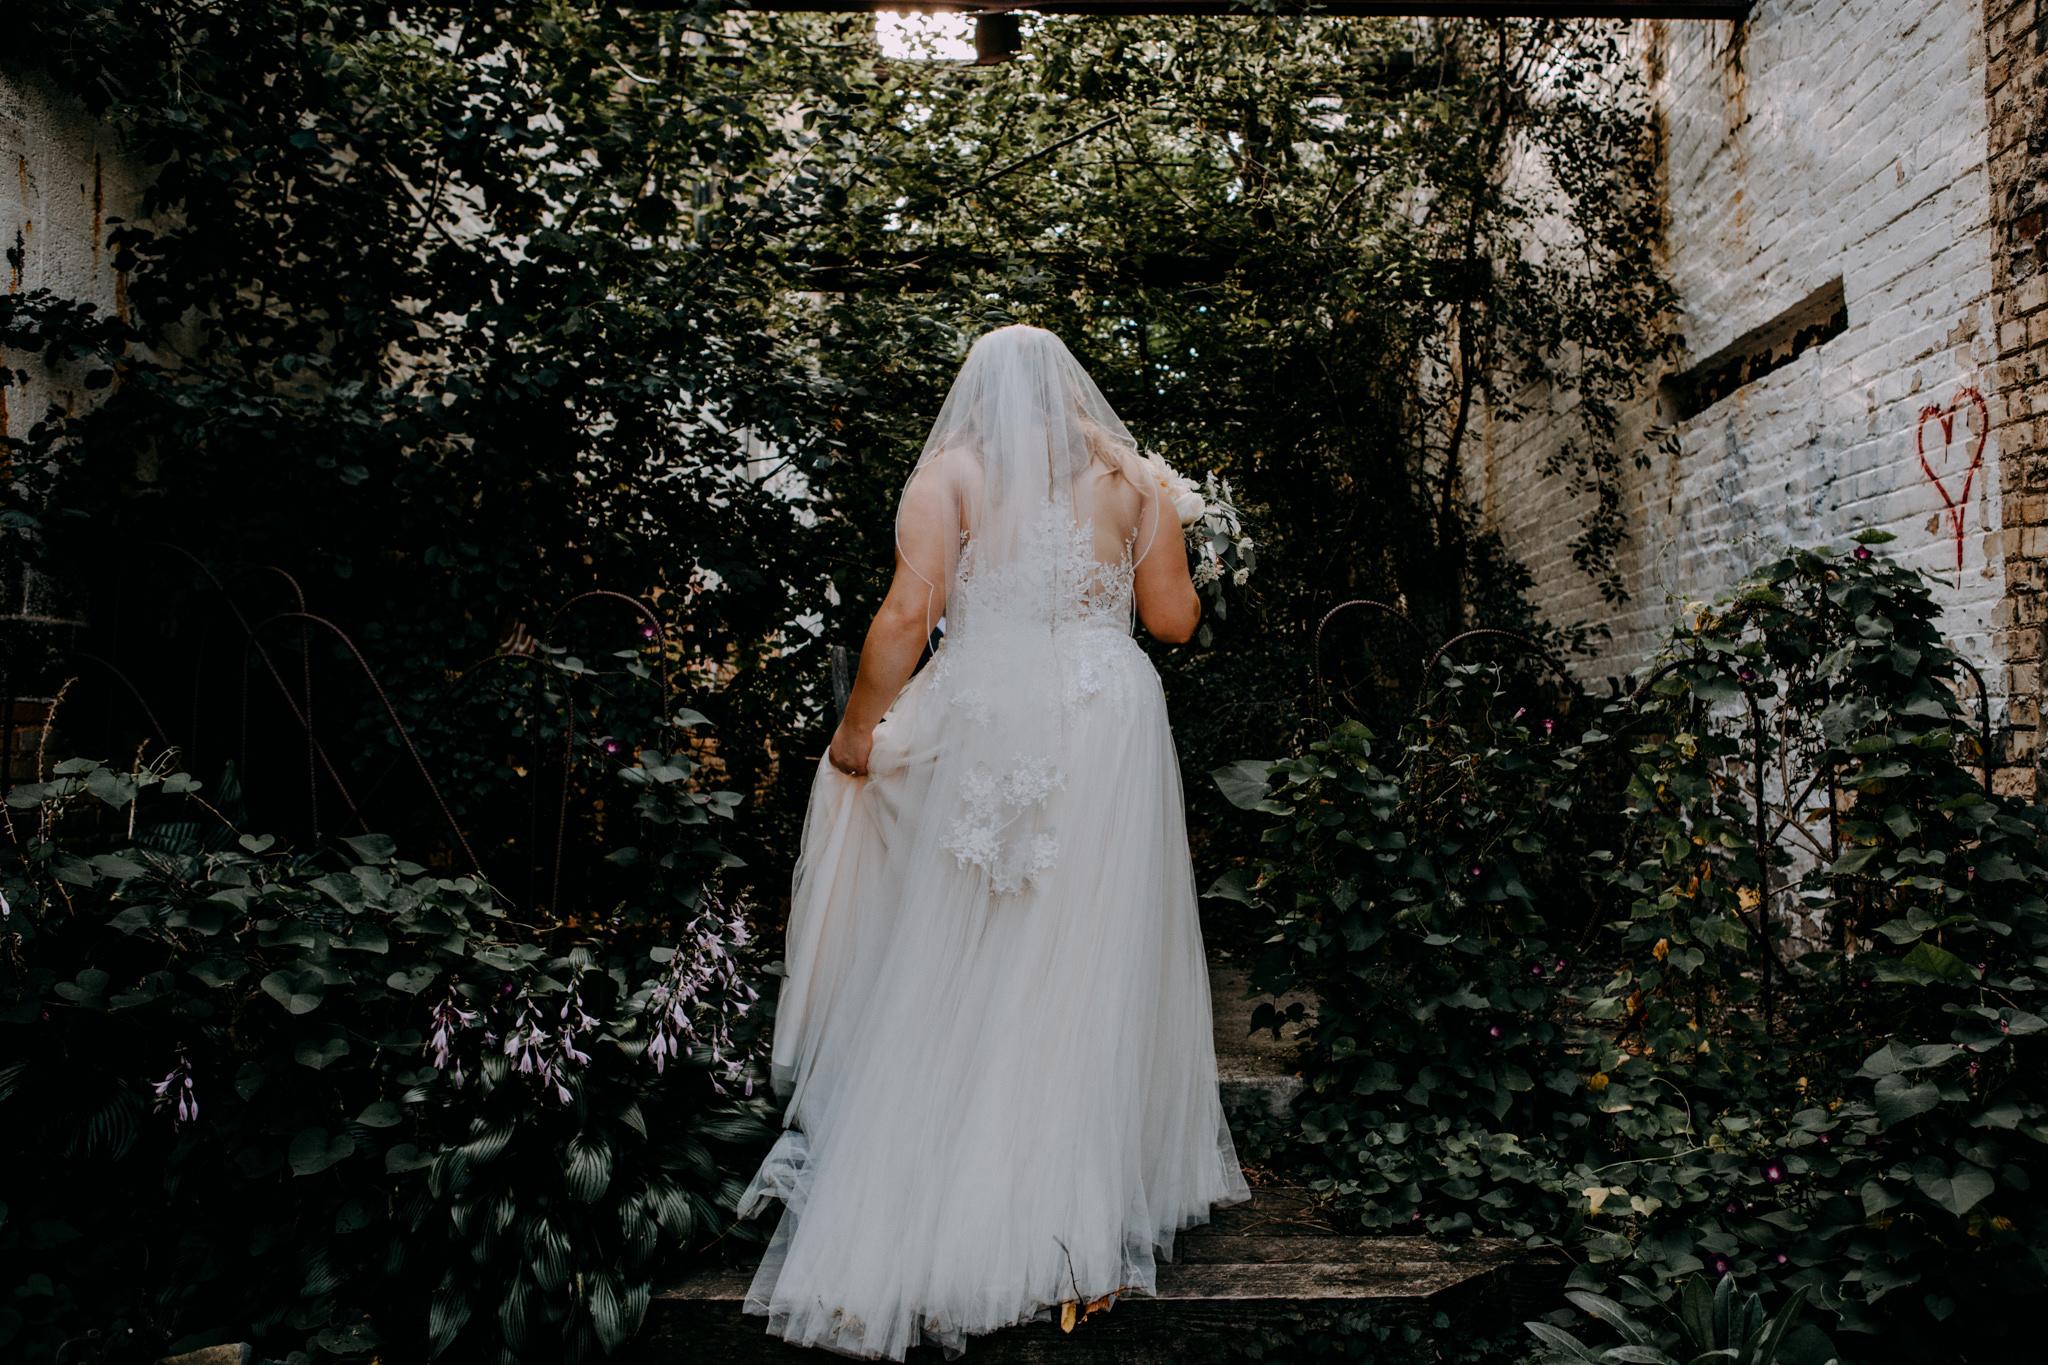 alternative wedding photo